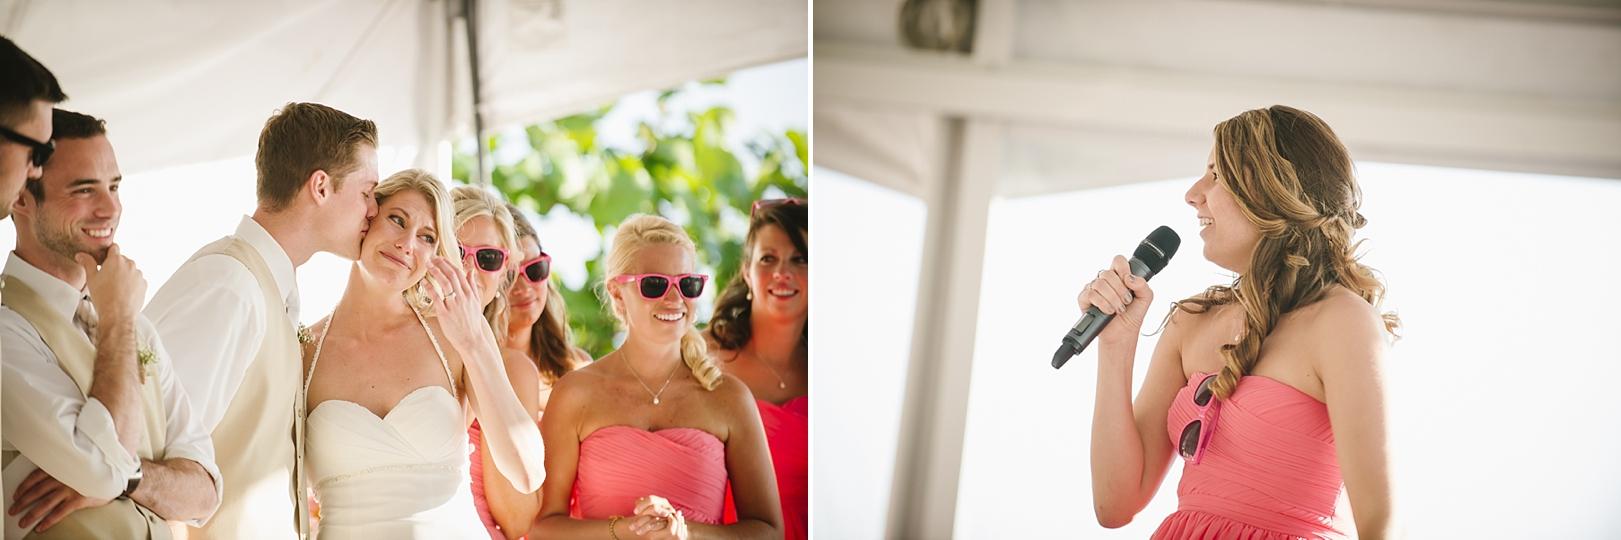 toasts sirata beach wedding photos